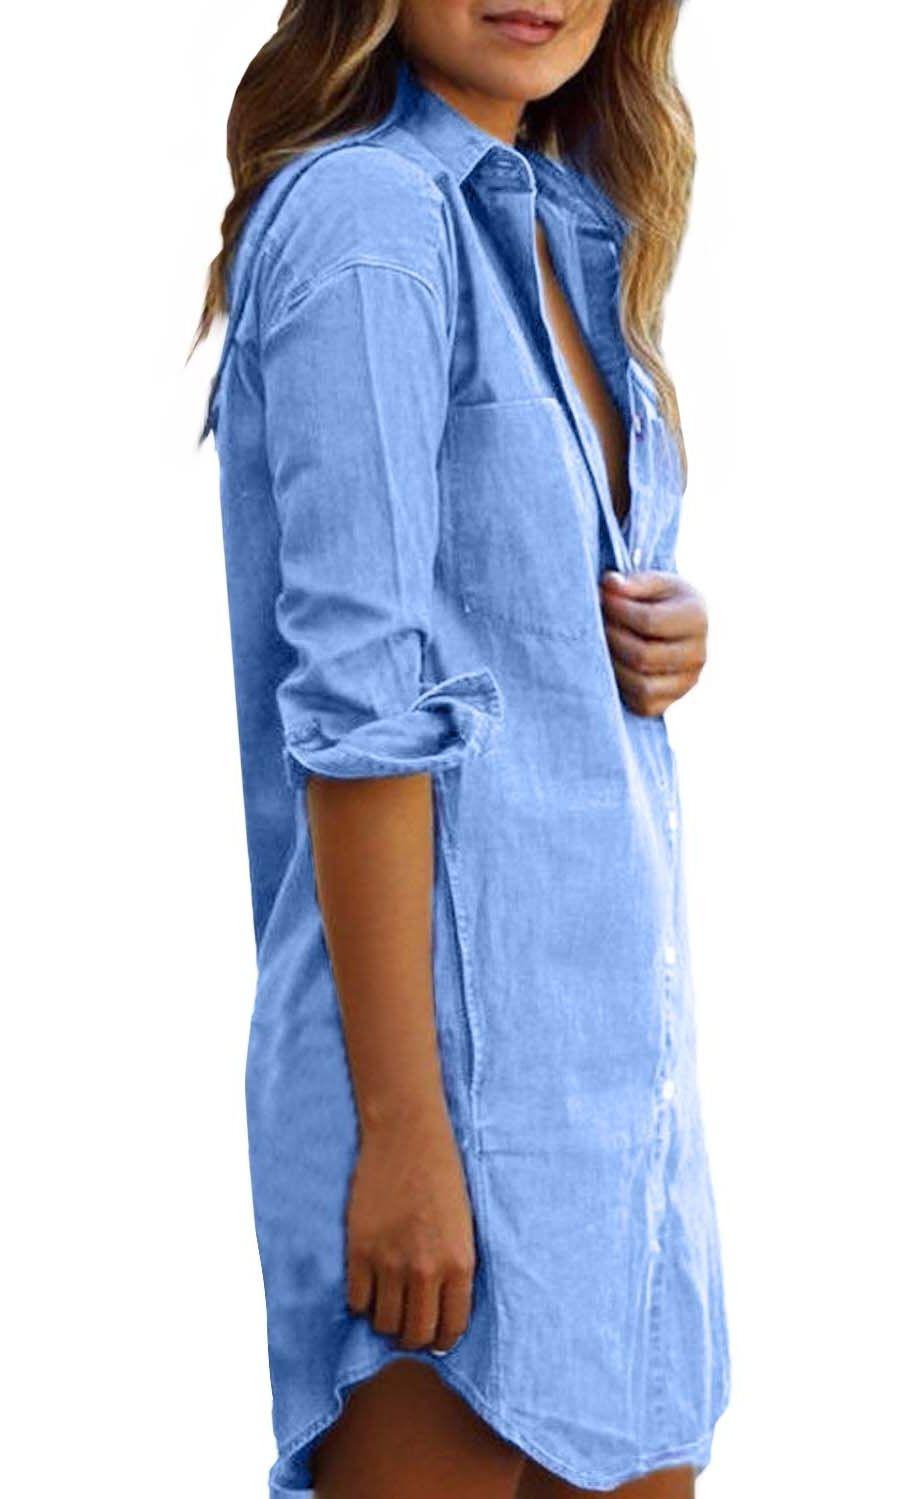 Mtony Llc Women S Long Sleeve Button Down Denim Shirt Dresses Above Knee Walmart Com Denim Shirt Dress Women Long Sleeve Fashion [ 1499 x 900 Pixel ]